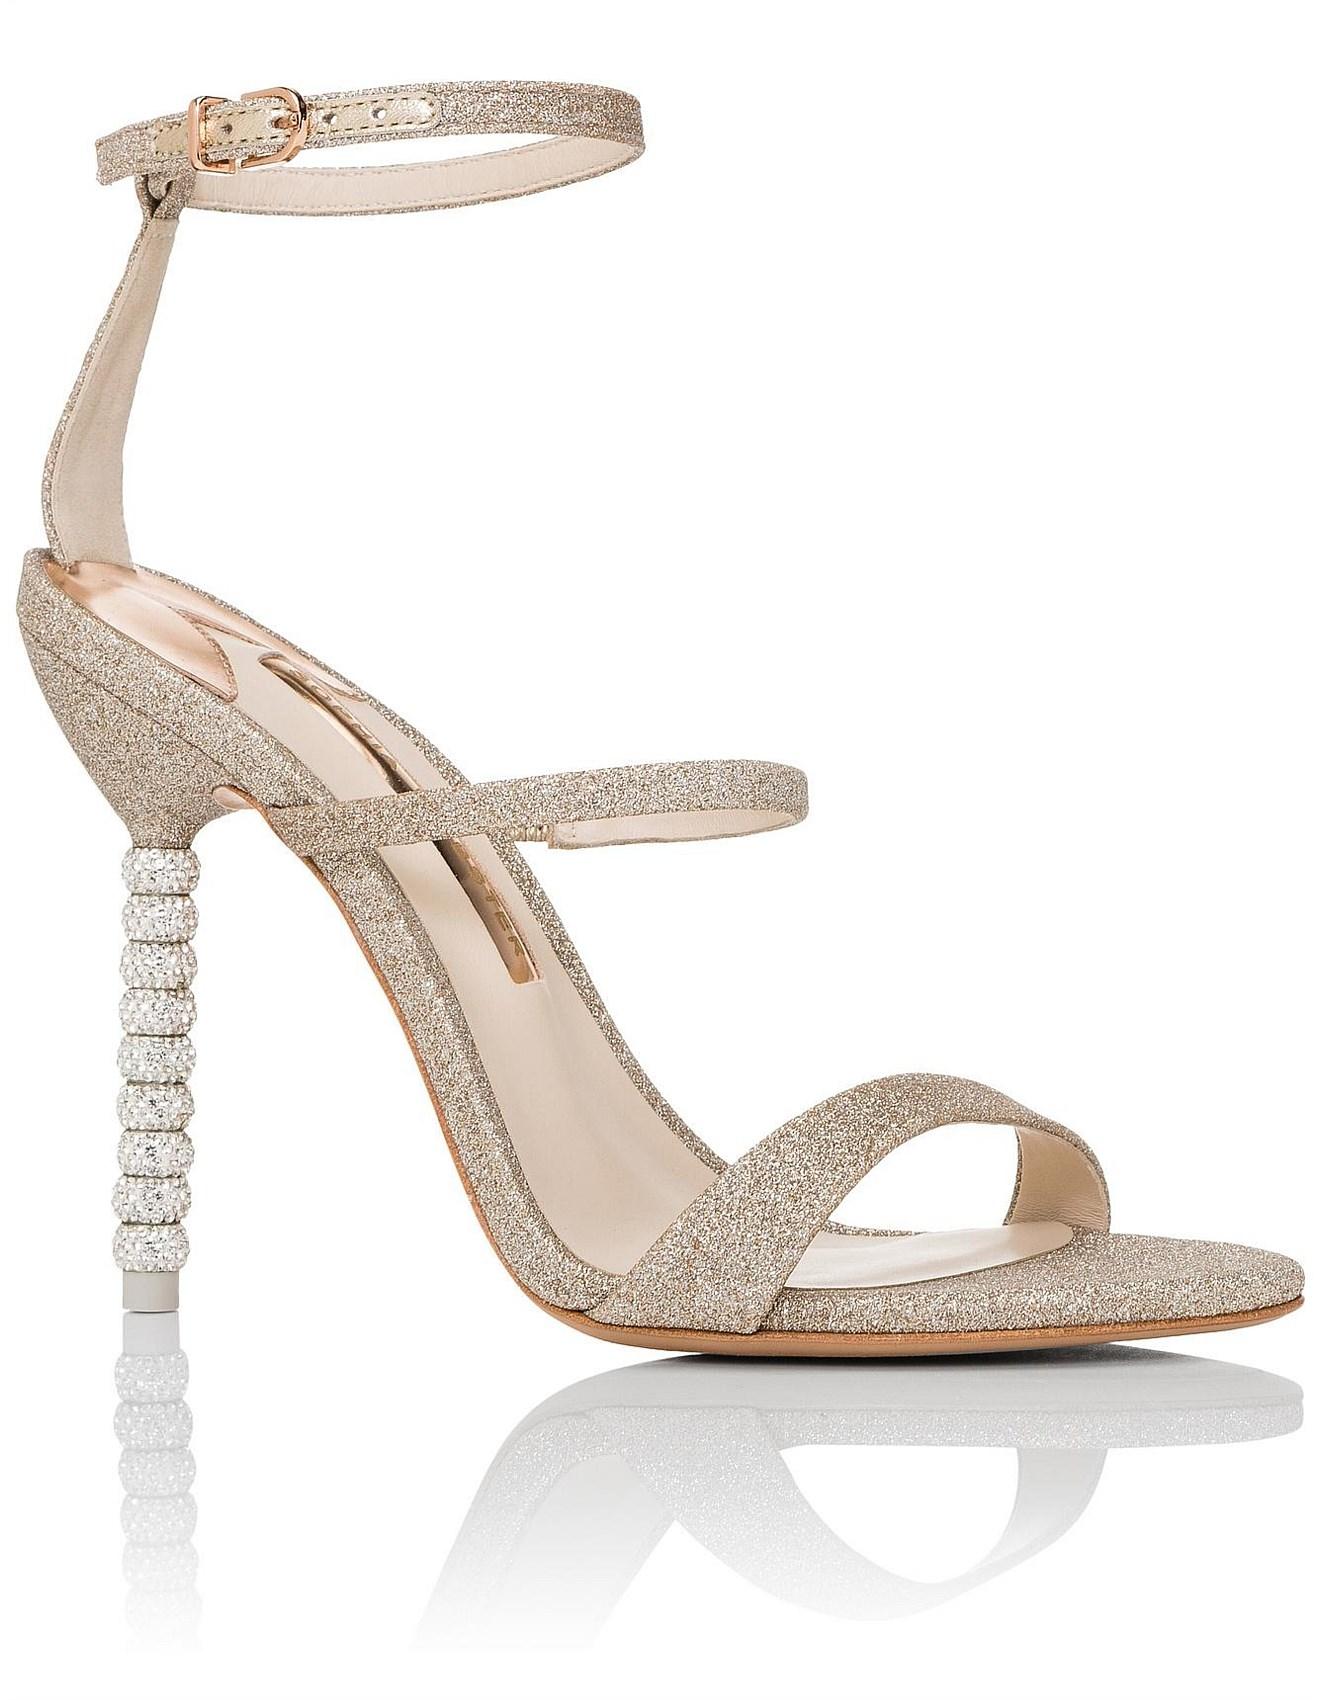 a7325ea3b Sophia Webster - Rosalind Crystal Sandal 100